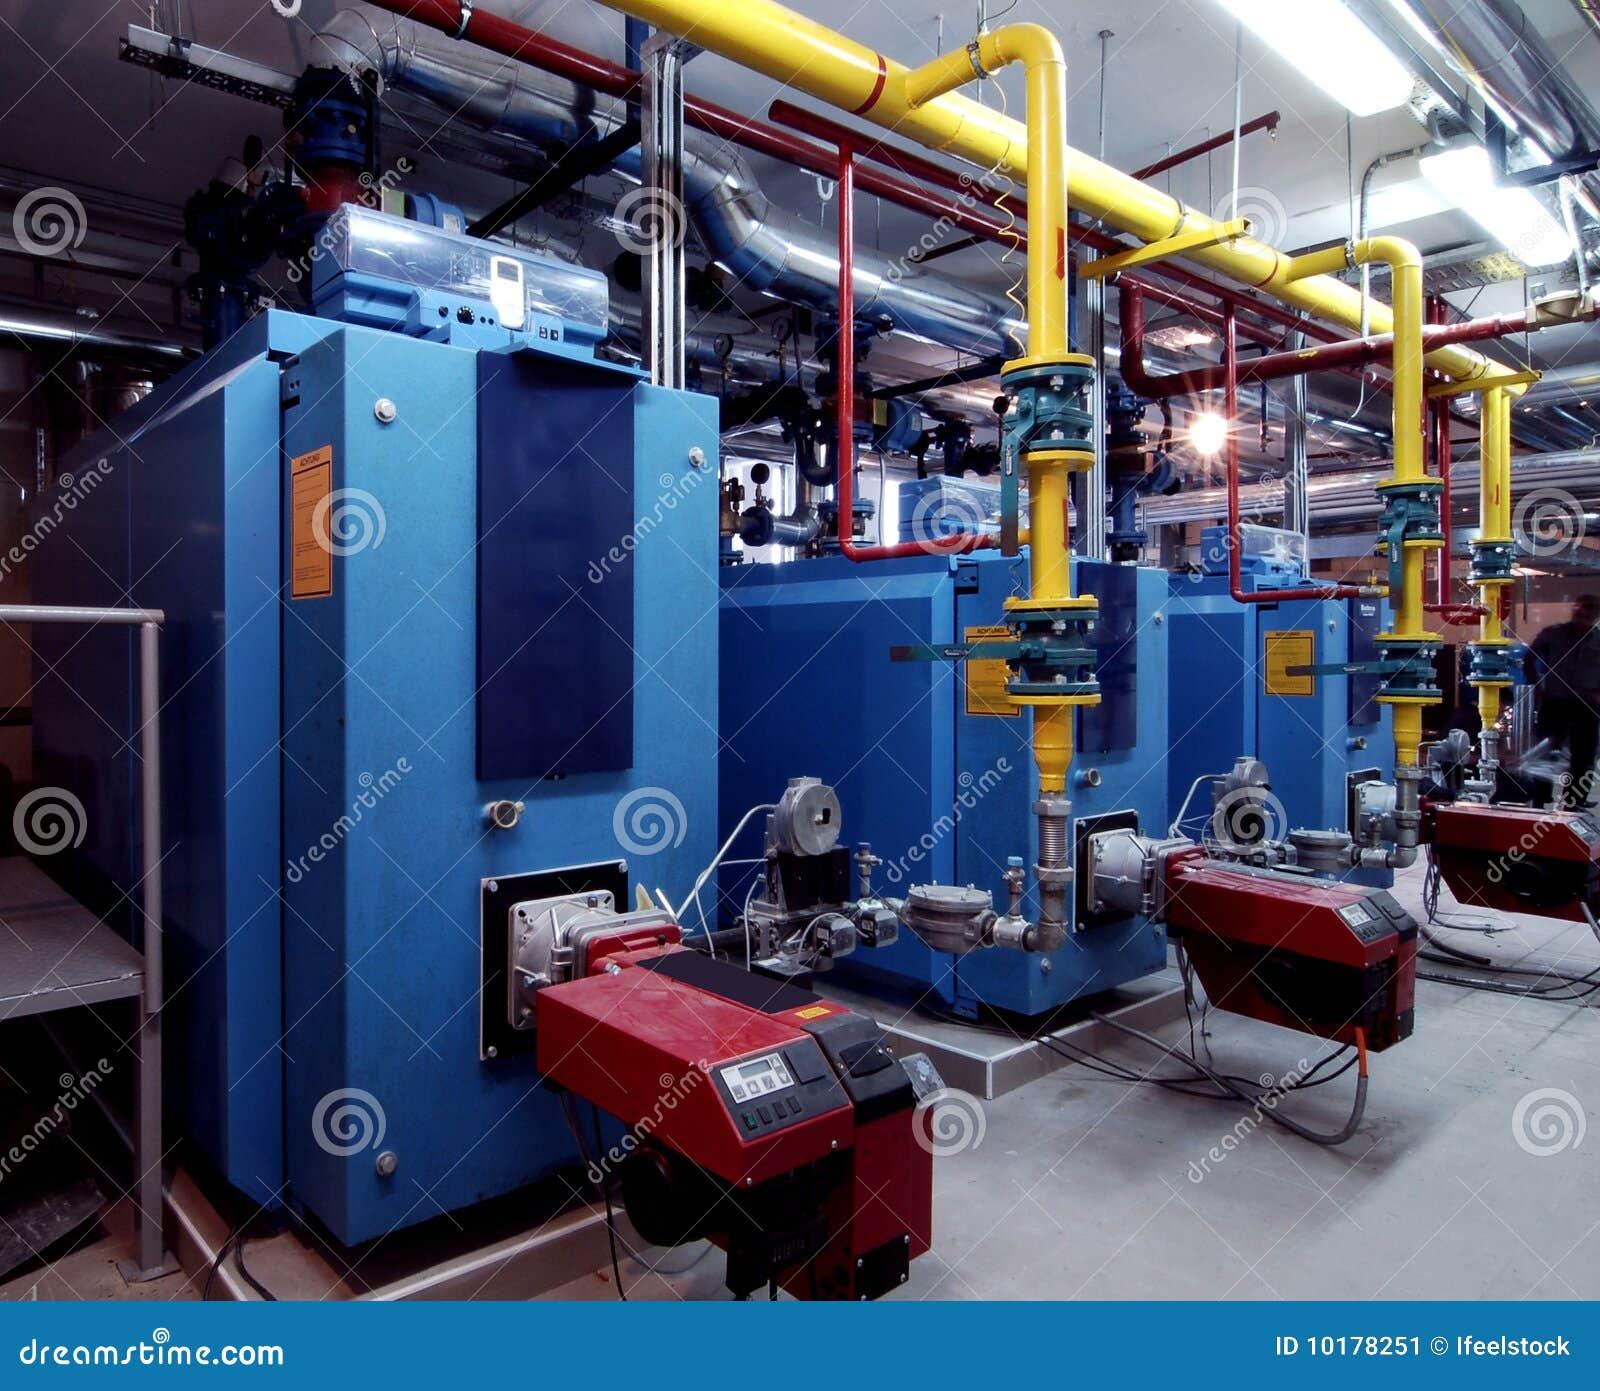 Interior of independent boiler average capacity modern